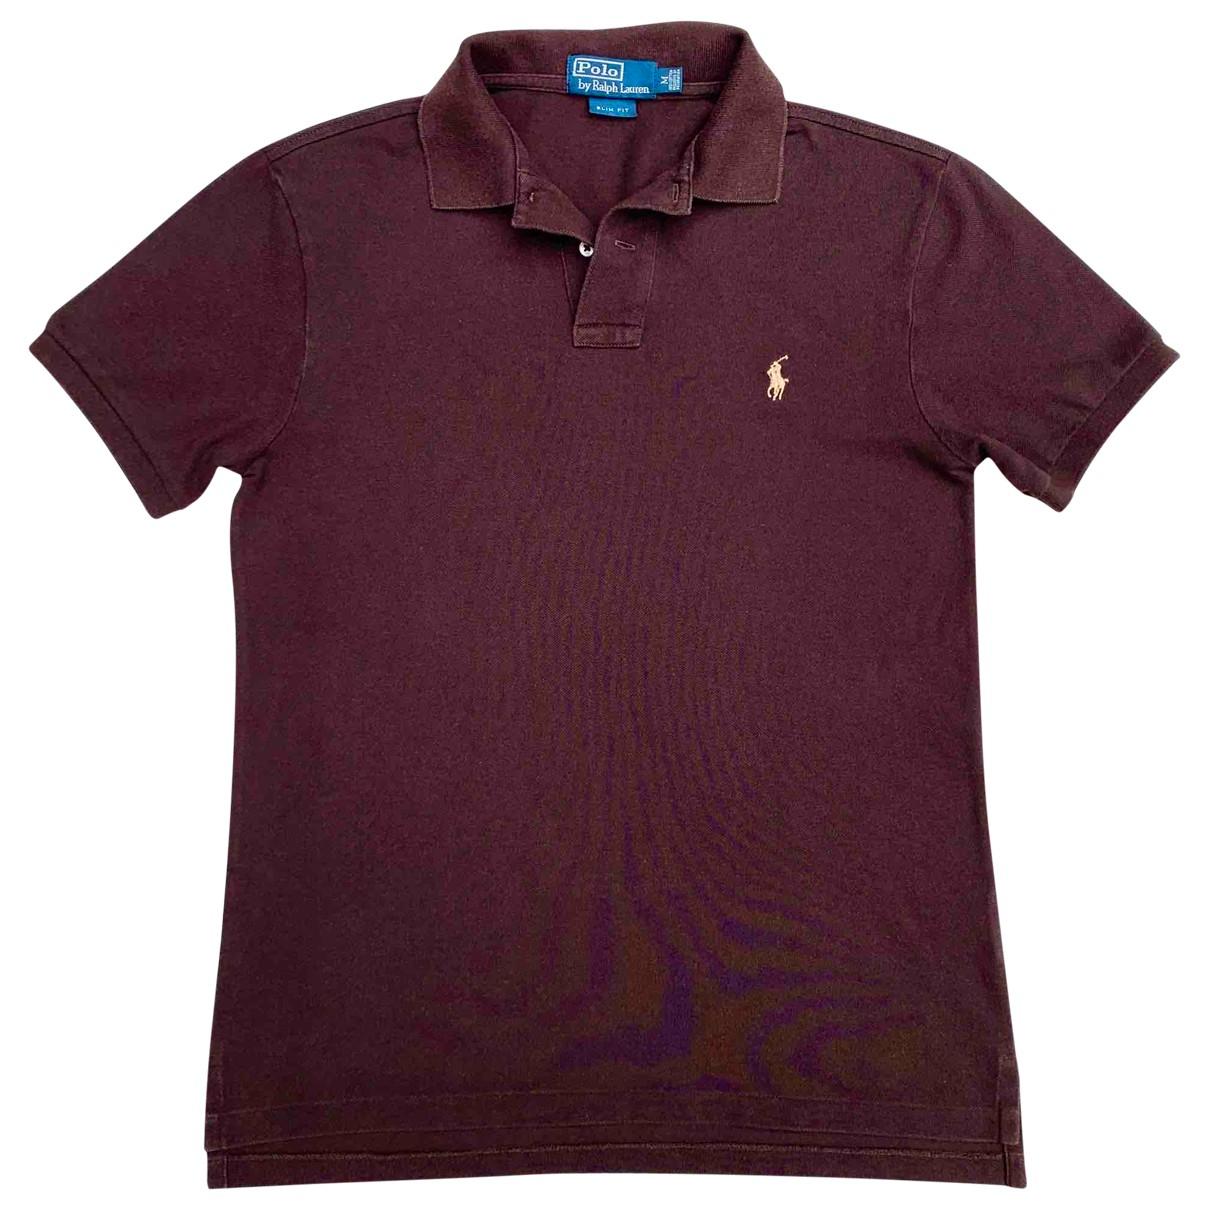 Polo Ralph Lauren Polo ajusté manches courtes Brown Cotton Polo shirts for Men M International